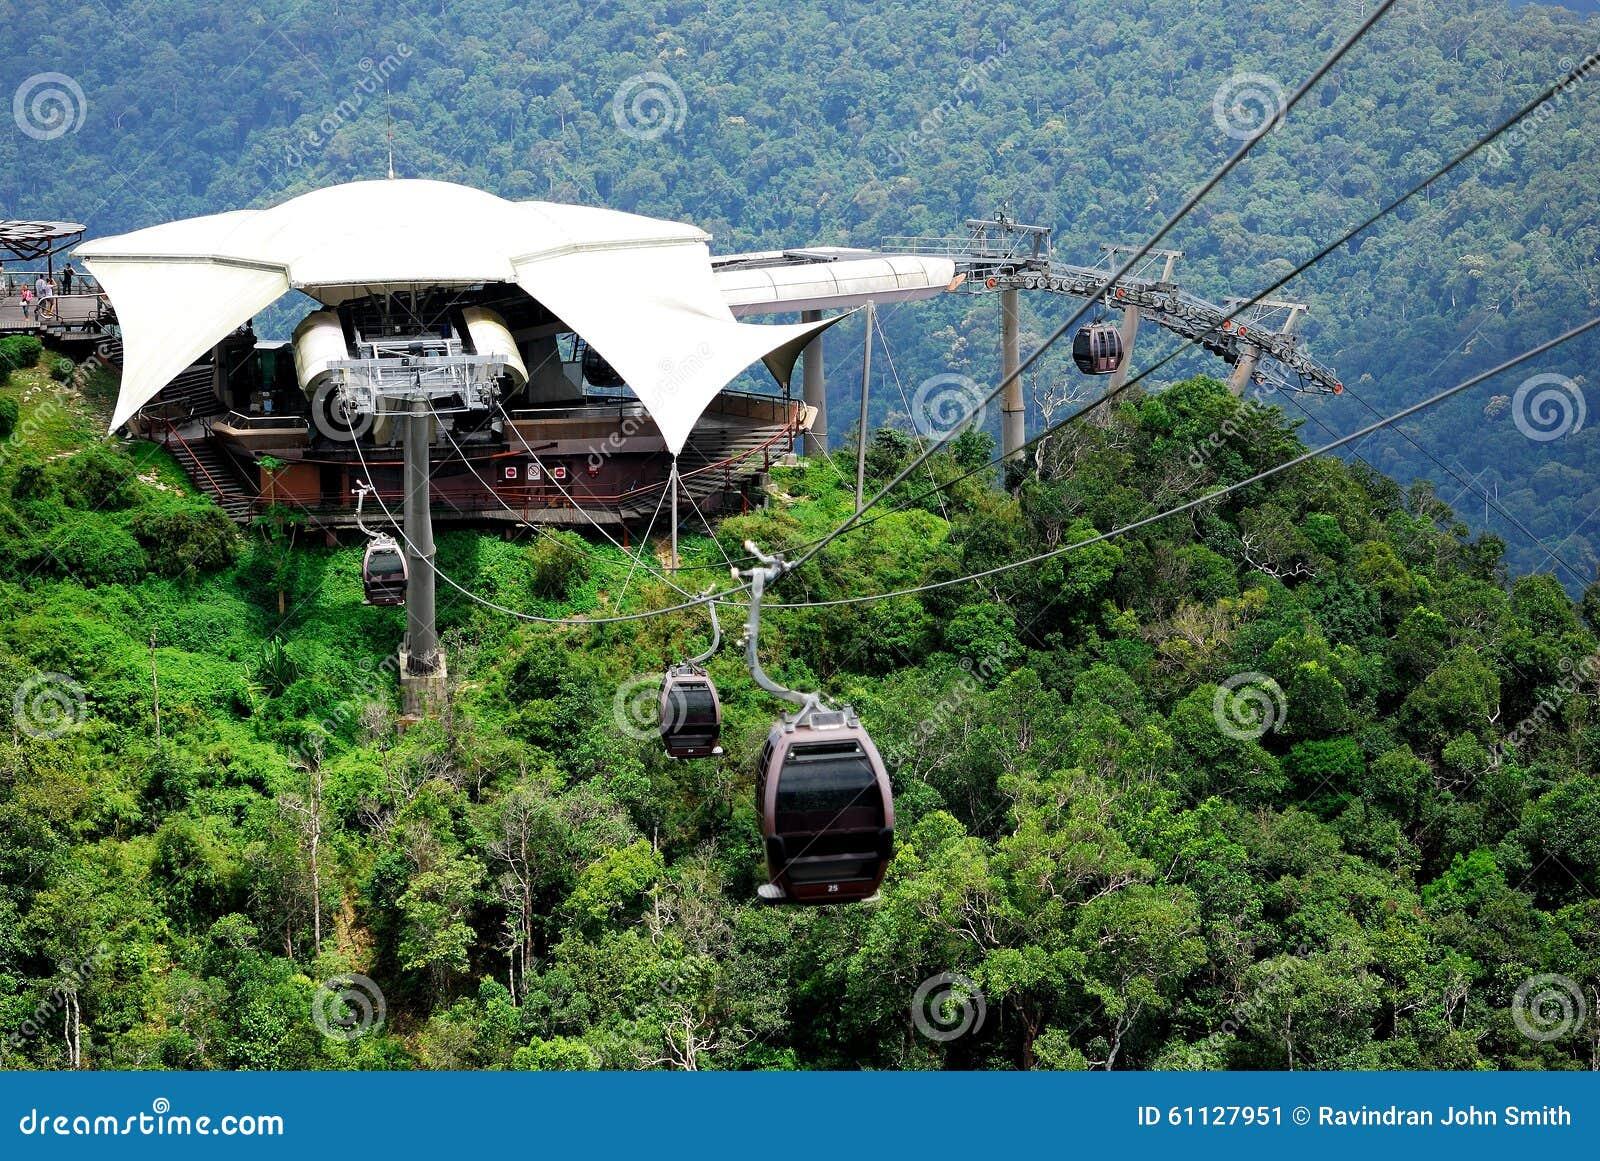 Langkawi Cable Car Sunset Stock Image Image Of Mountains 40721197